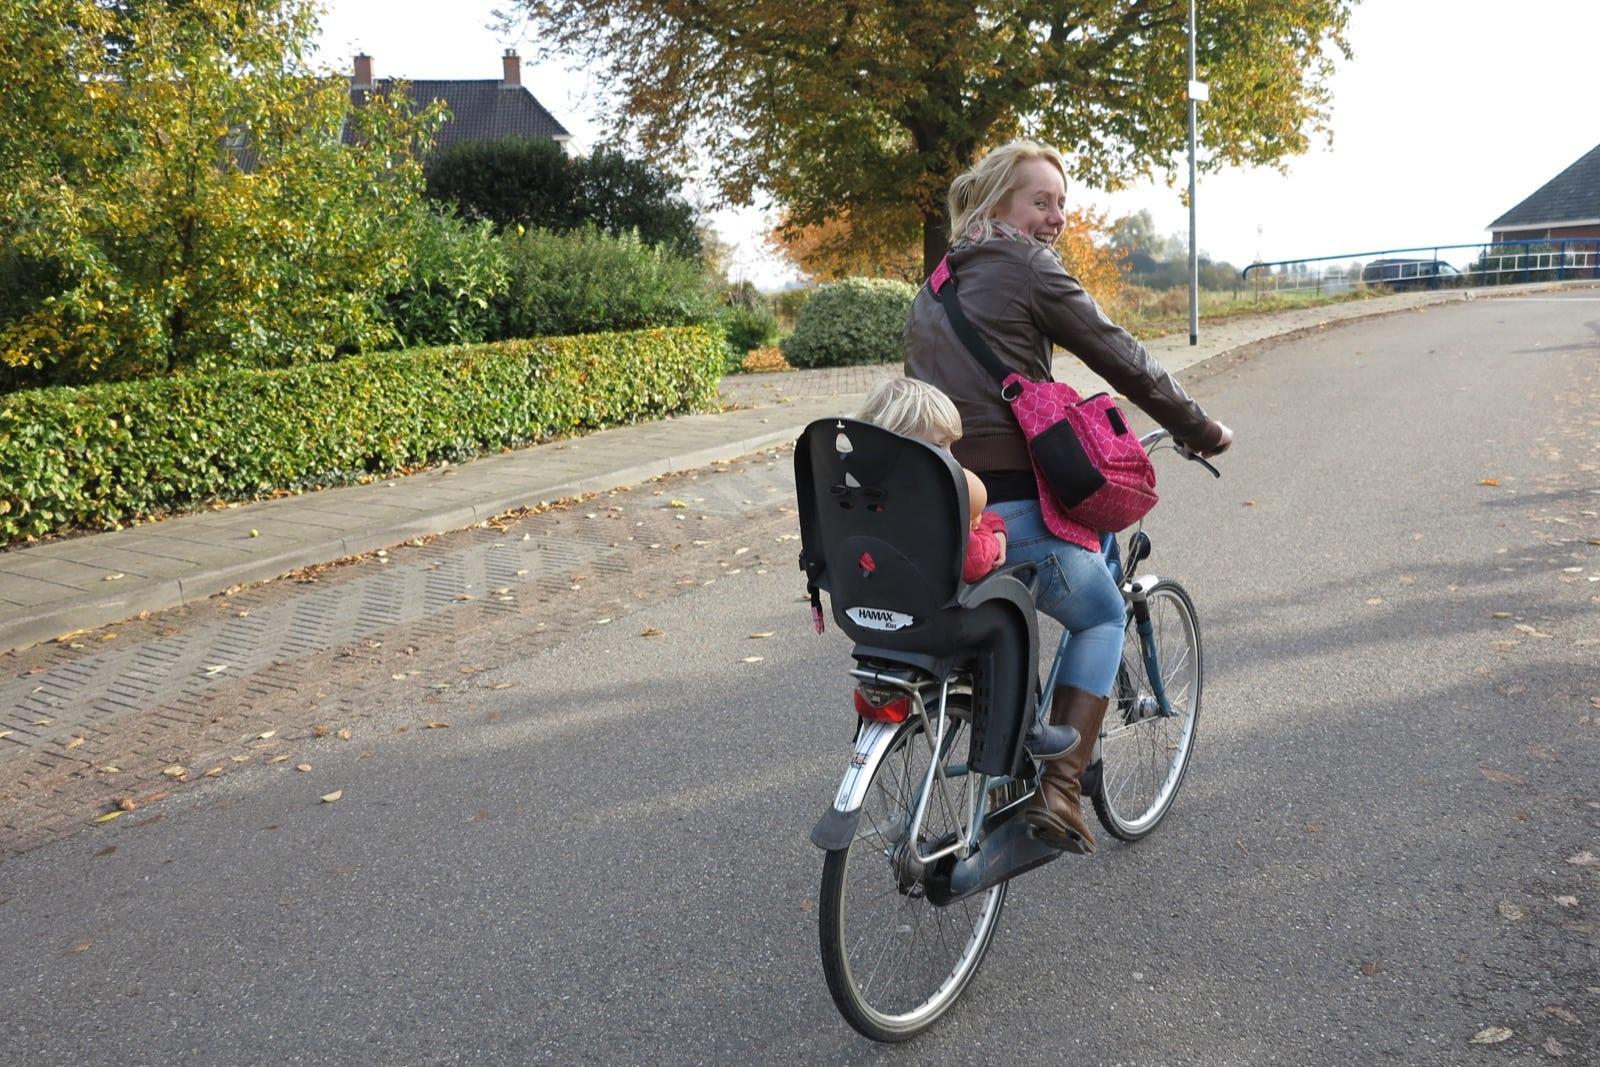 et-fiets-en-fietser-99-jessica-blaauw-oi.jpg